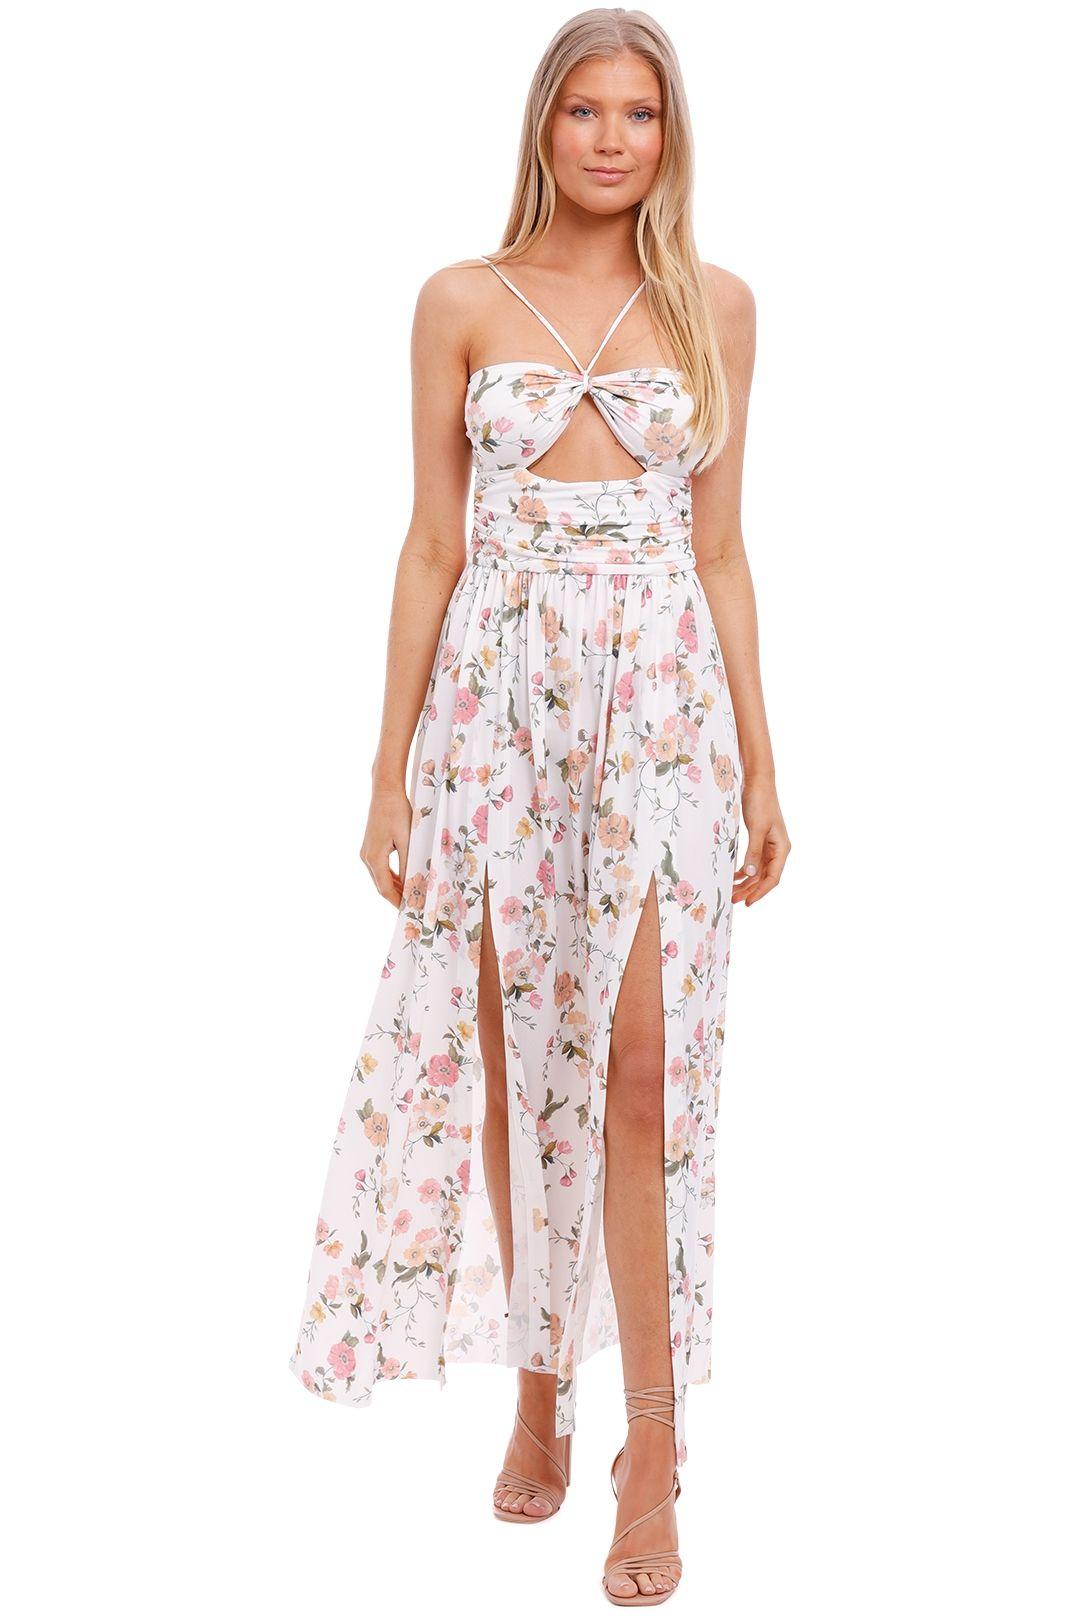 Bec and Bridge Isla Print Midi Dress floral